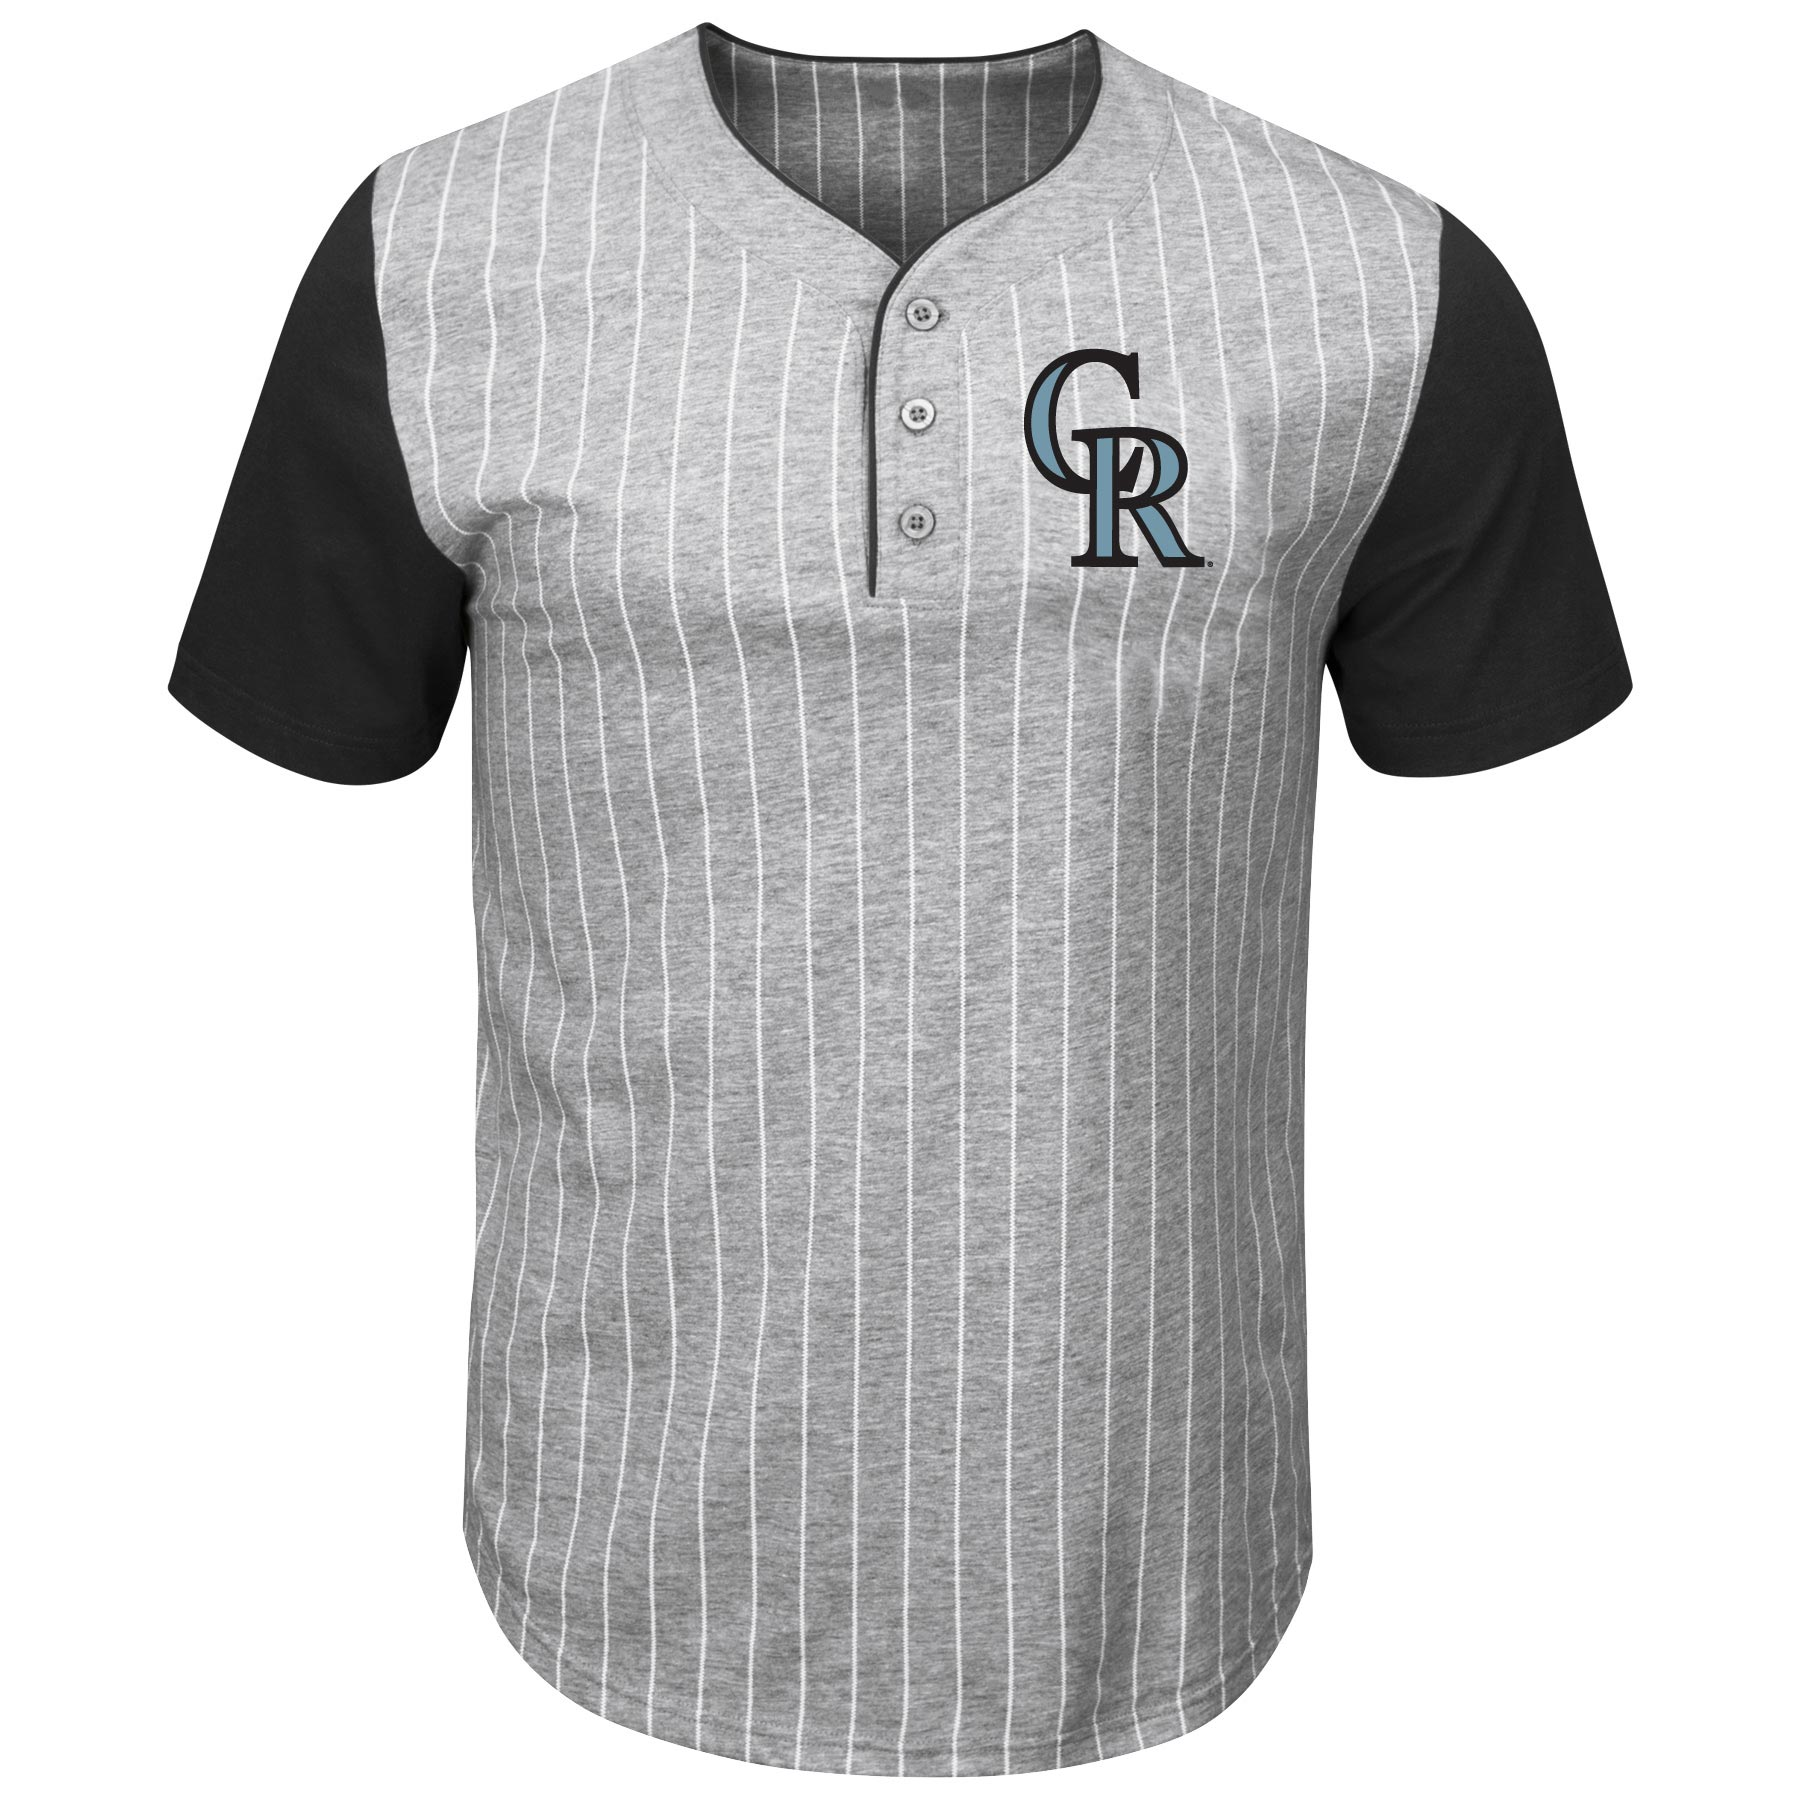 Colorado Rockies Majestic Big & Tall Life or Death Pinstripe Henley T-Shirt - Gray/Black